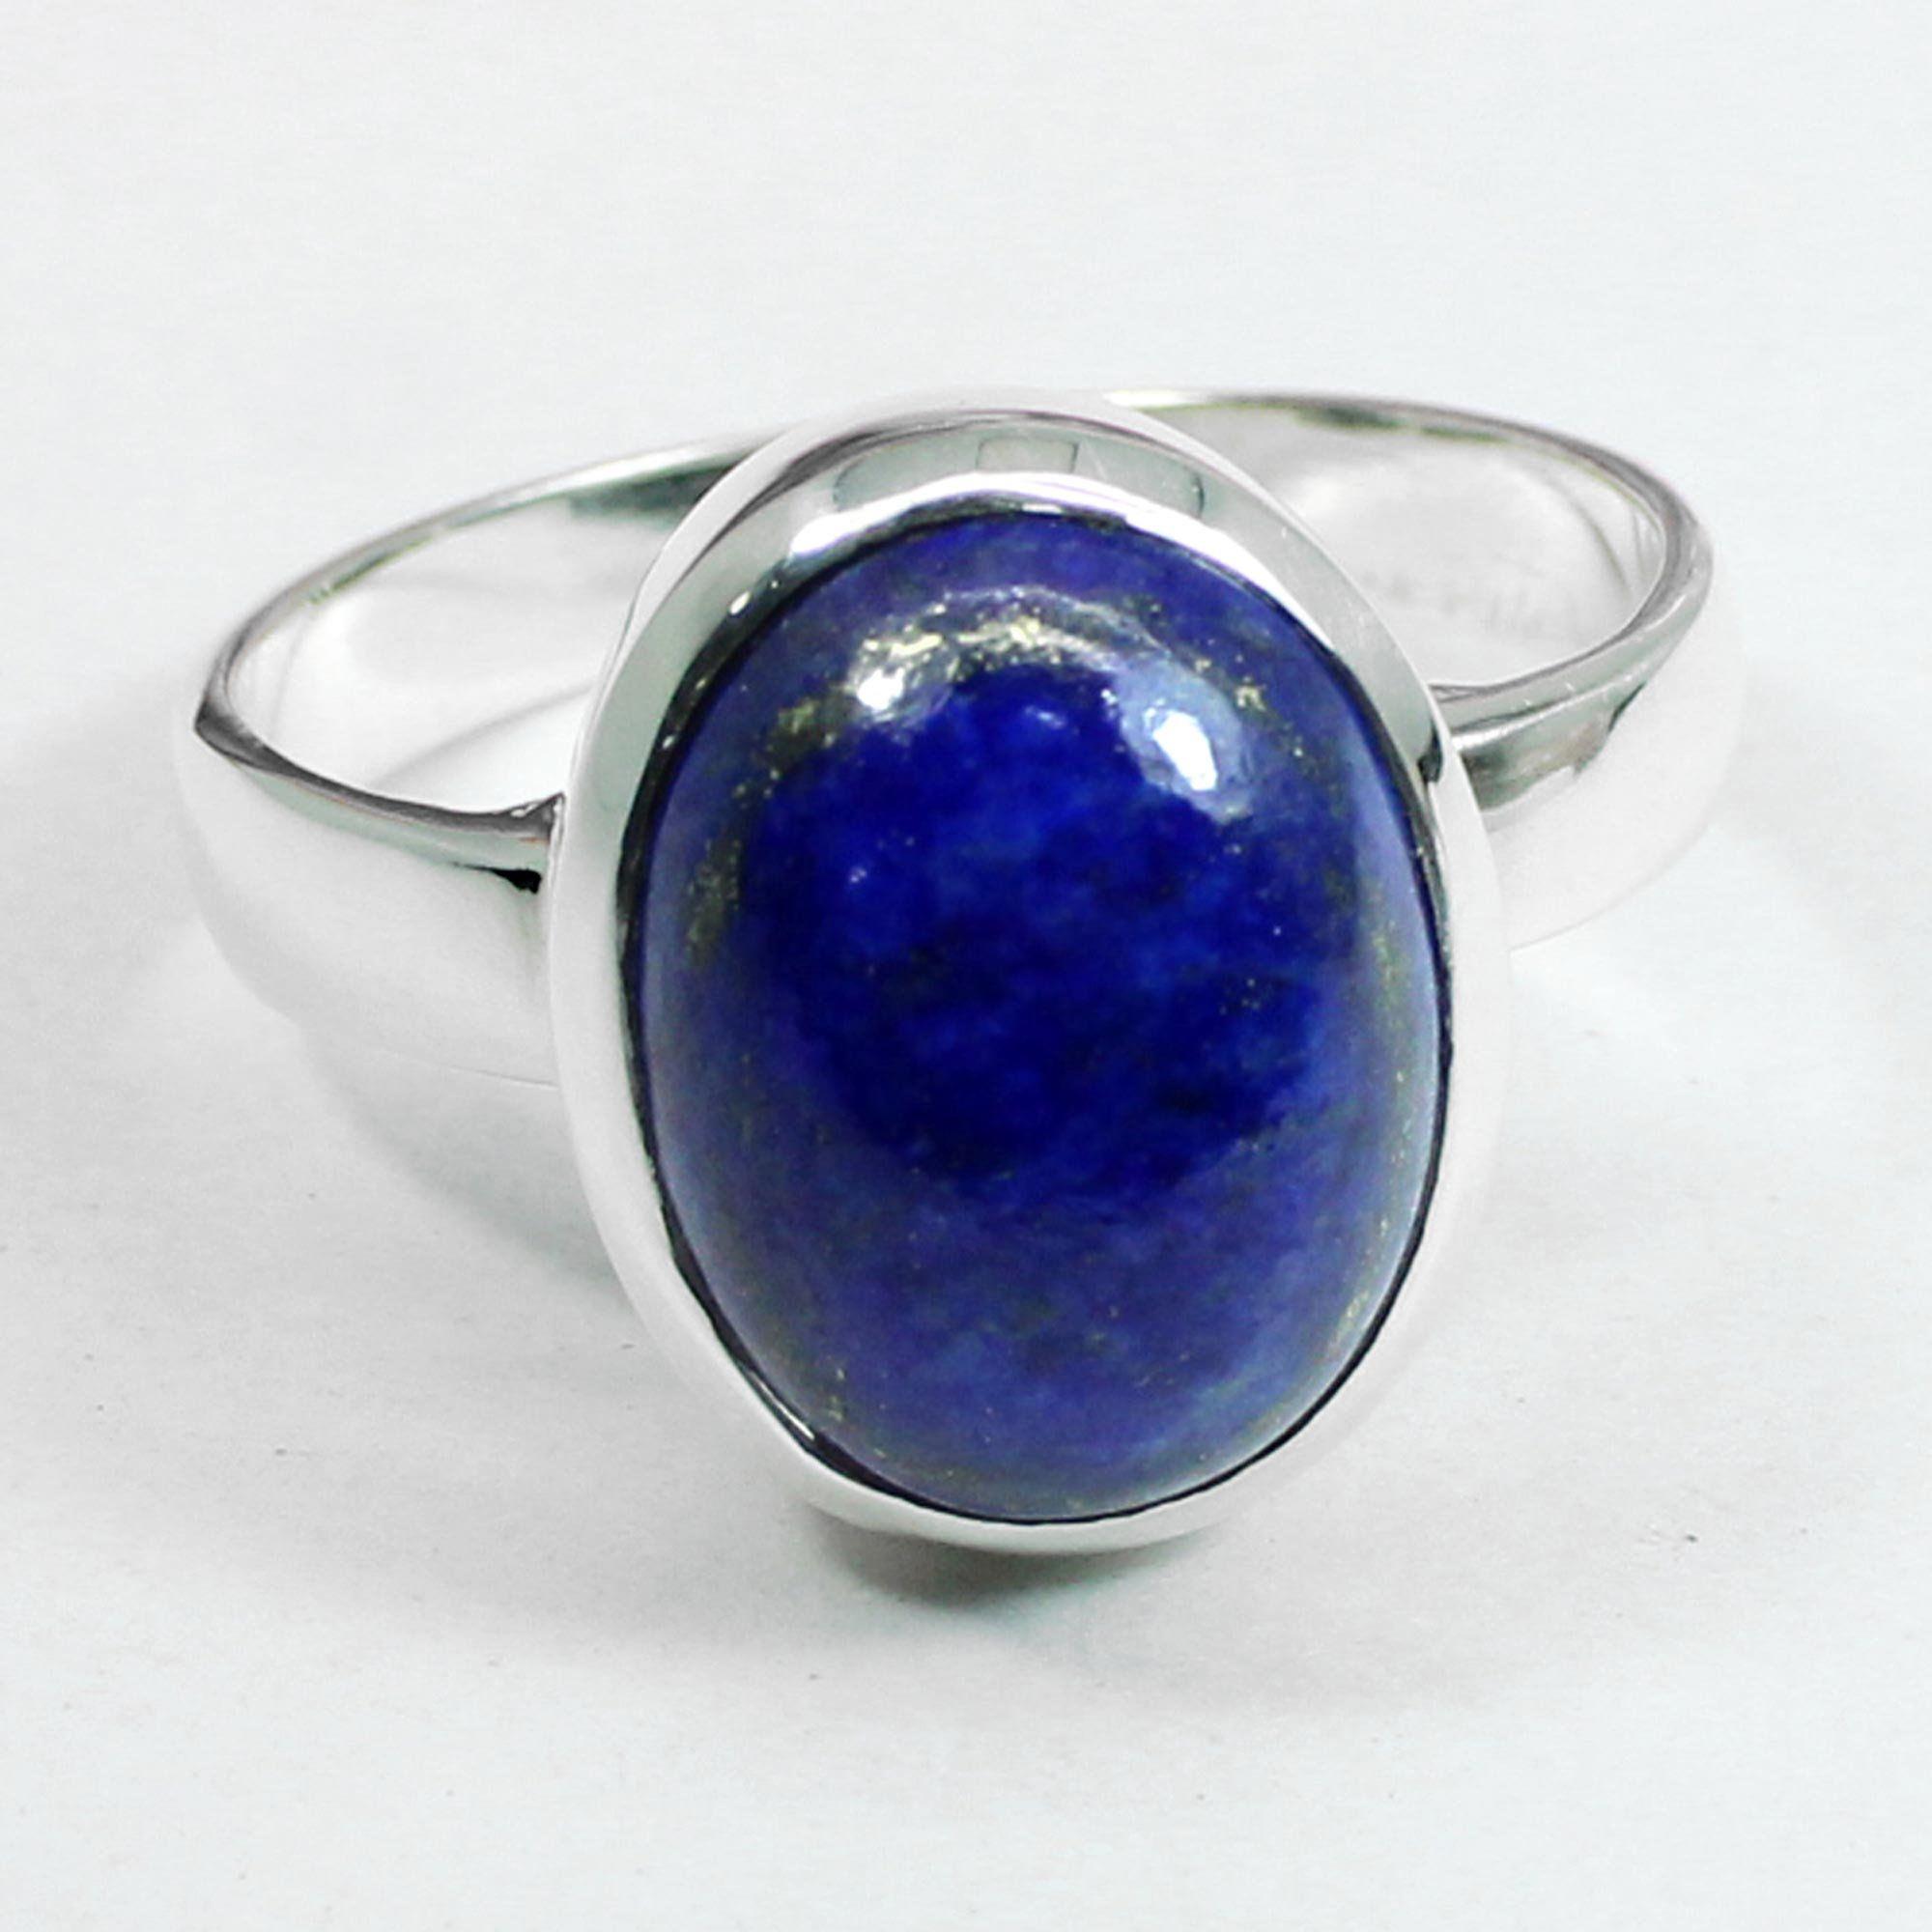 Lapis lazuli Gemstone Ring Sterling Silver Ring Rectangle Stone Designer Silver Band Lapis Silver Ring Statement Dainty,Bohemian Ring